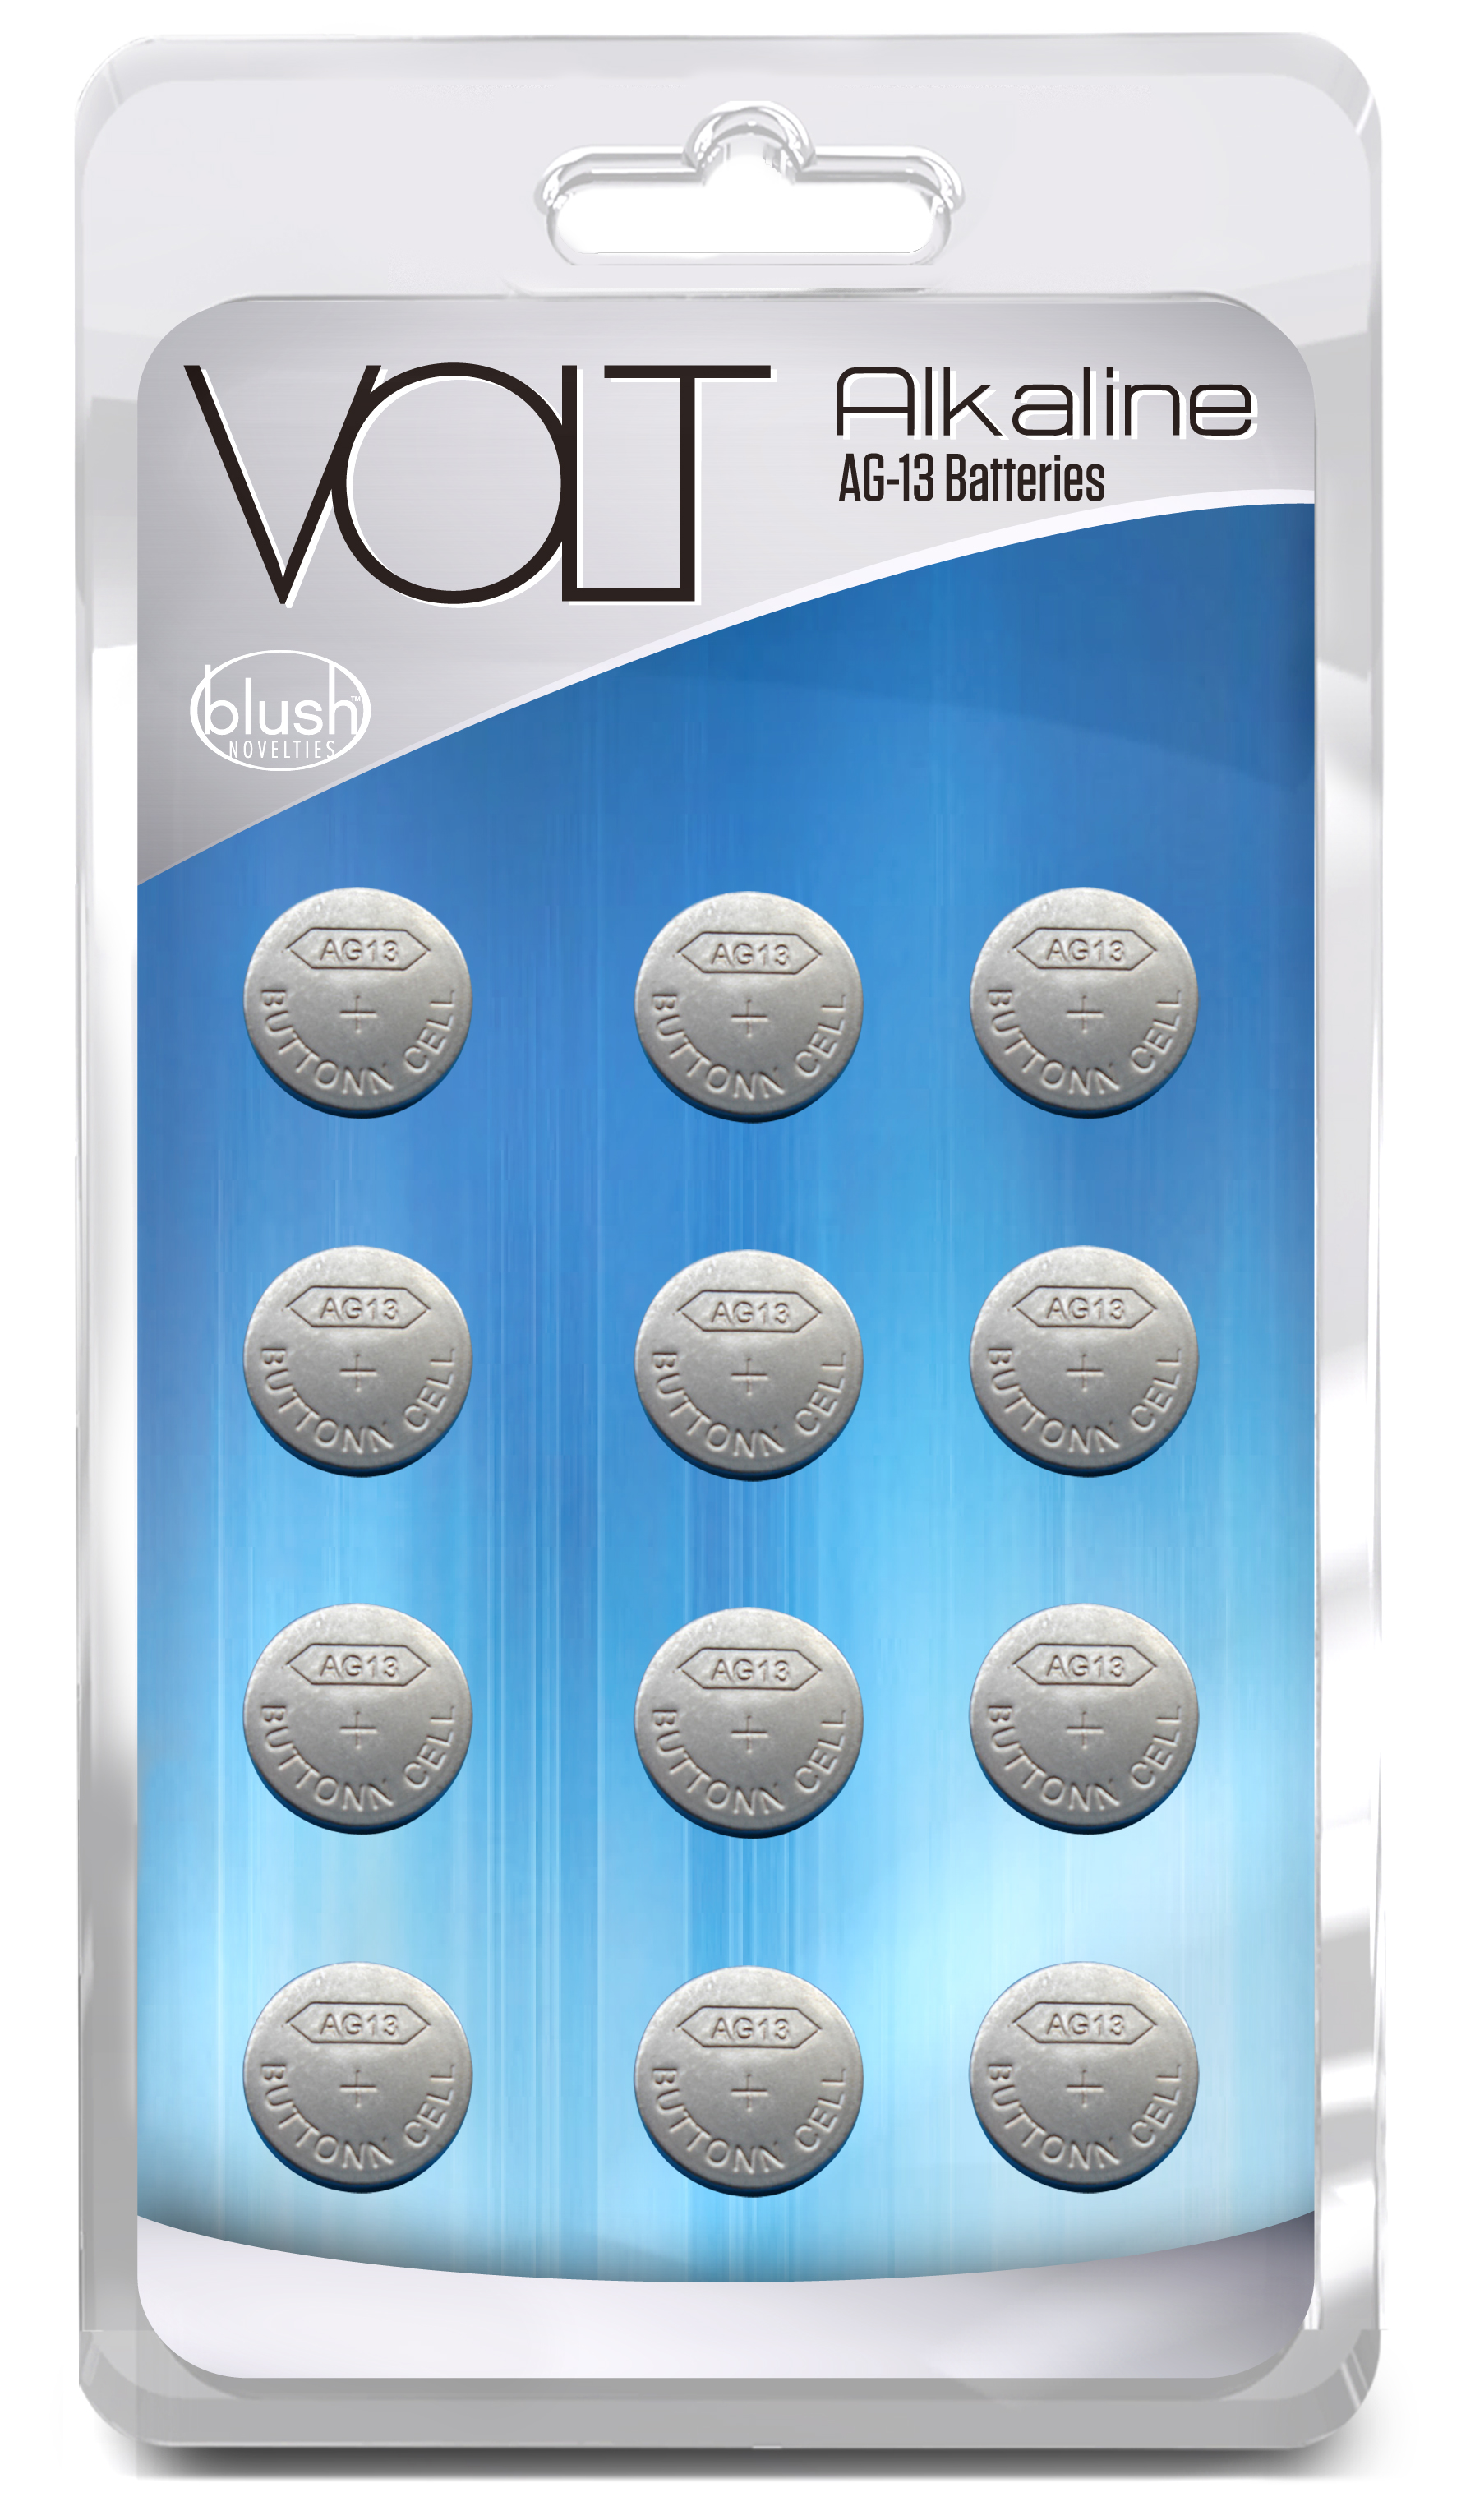 Volt - Alkaline Batteries